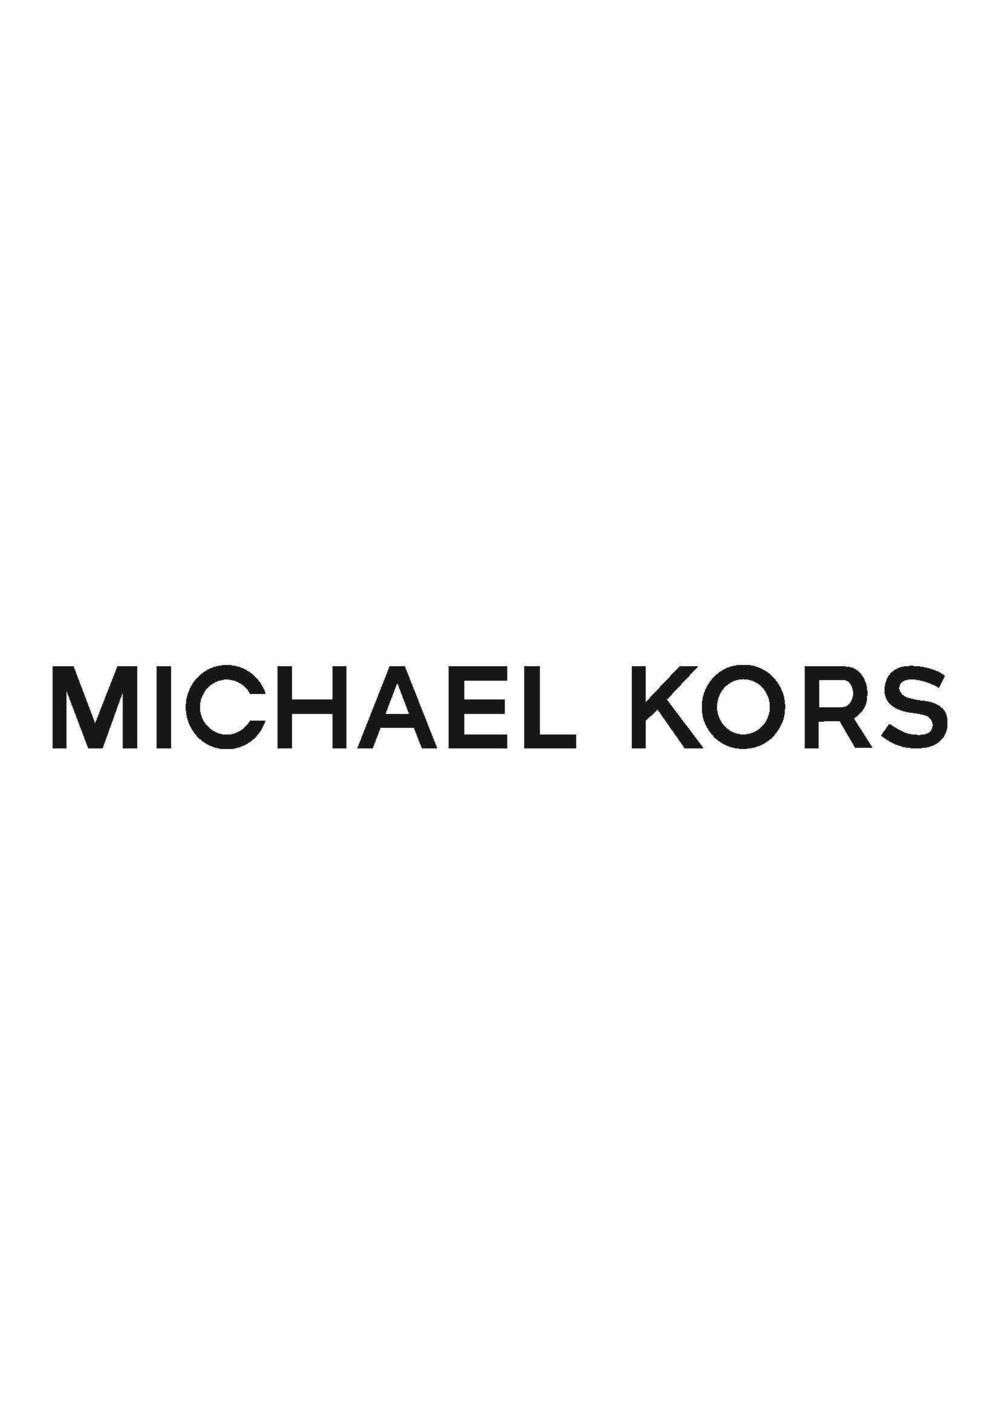 Michael-Kors-Logo-e1523905120406.png